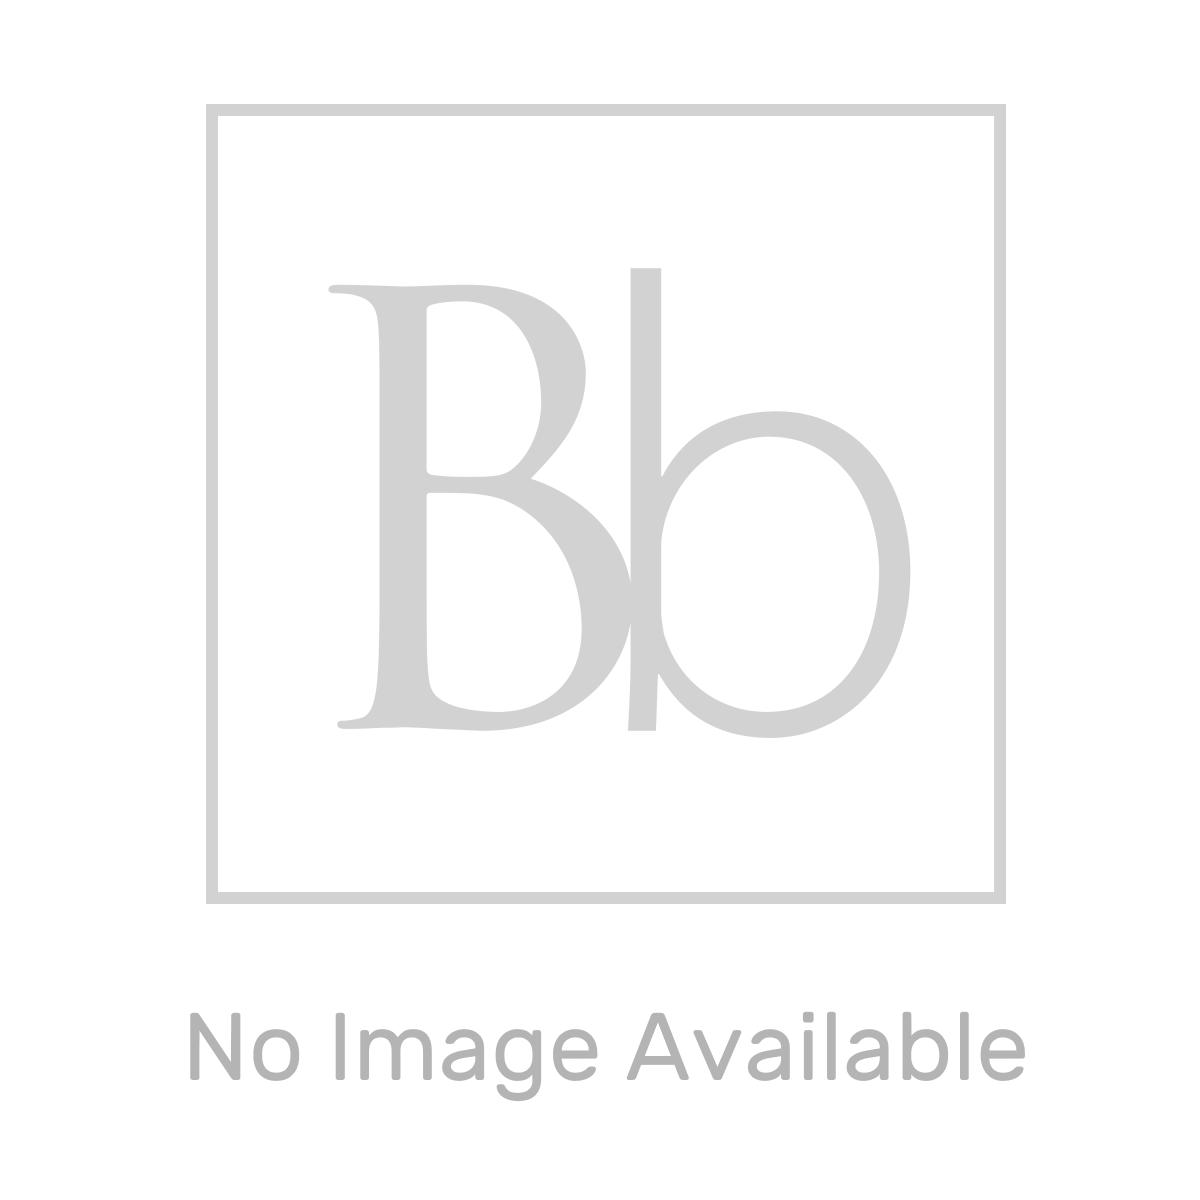 Aquadart Rectangular 1600 x 760 Shower Tray